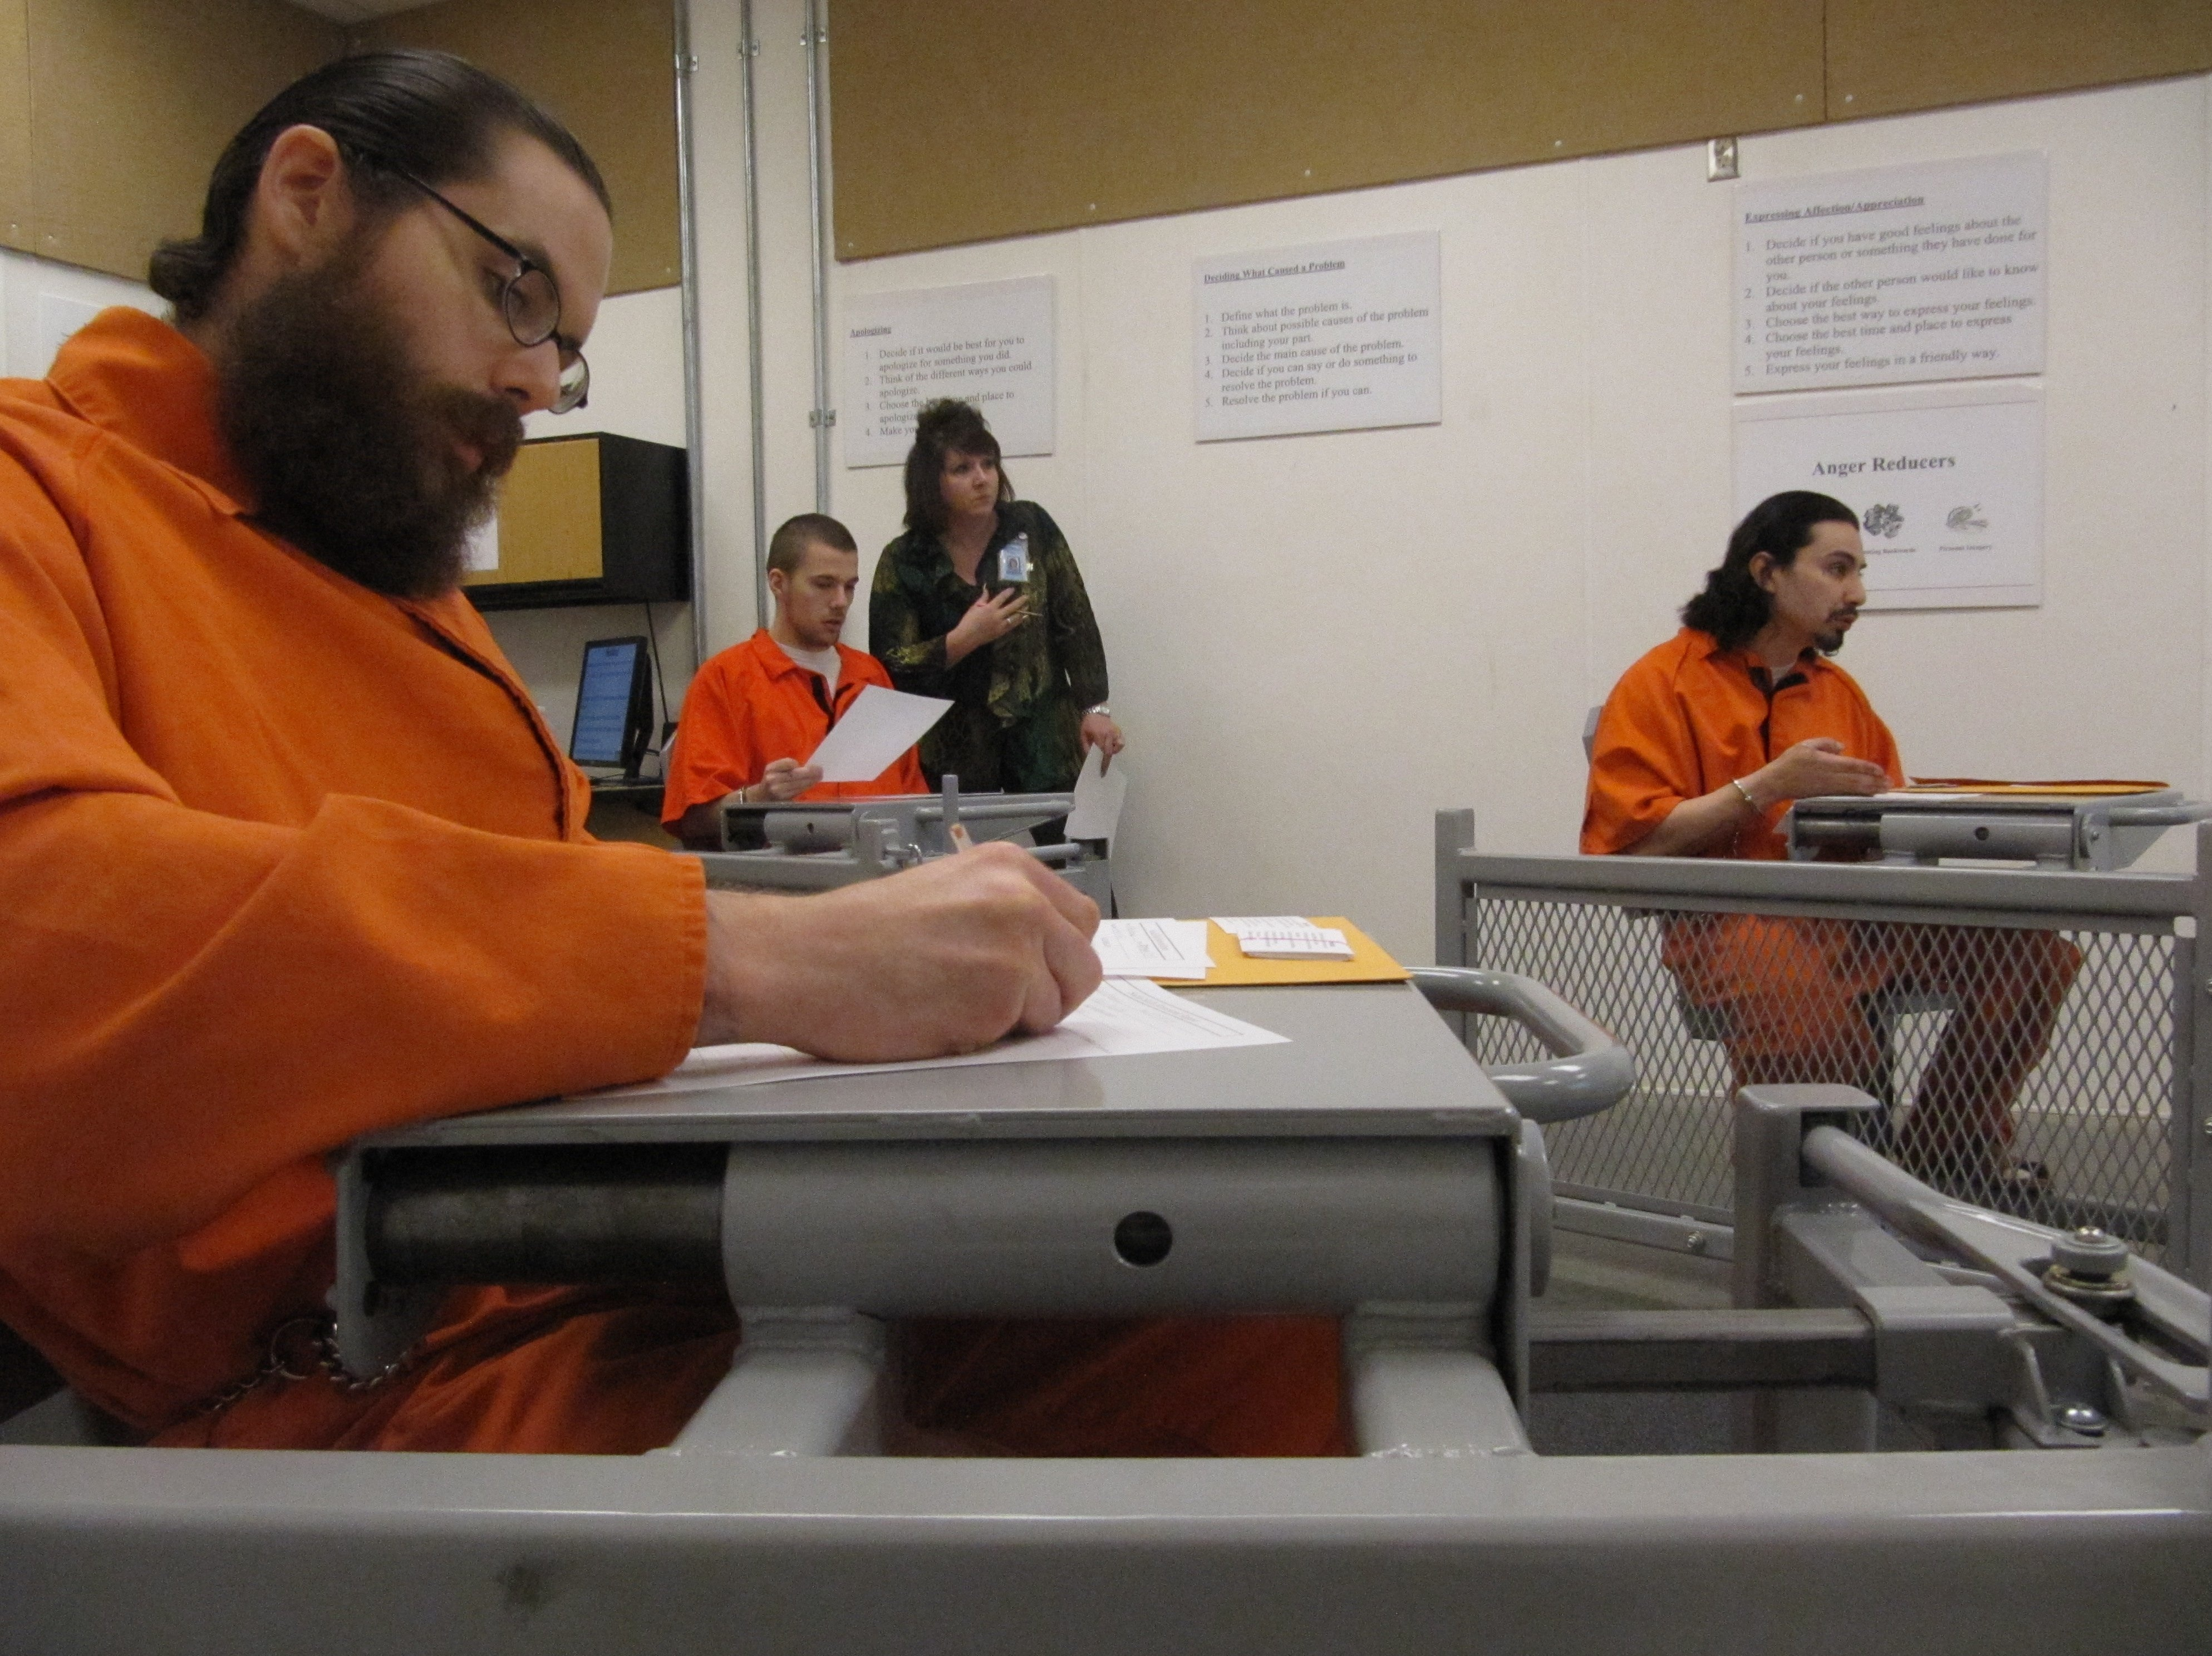 Prison program reaches out to segregated inmates | The Spokesman-Review